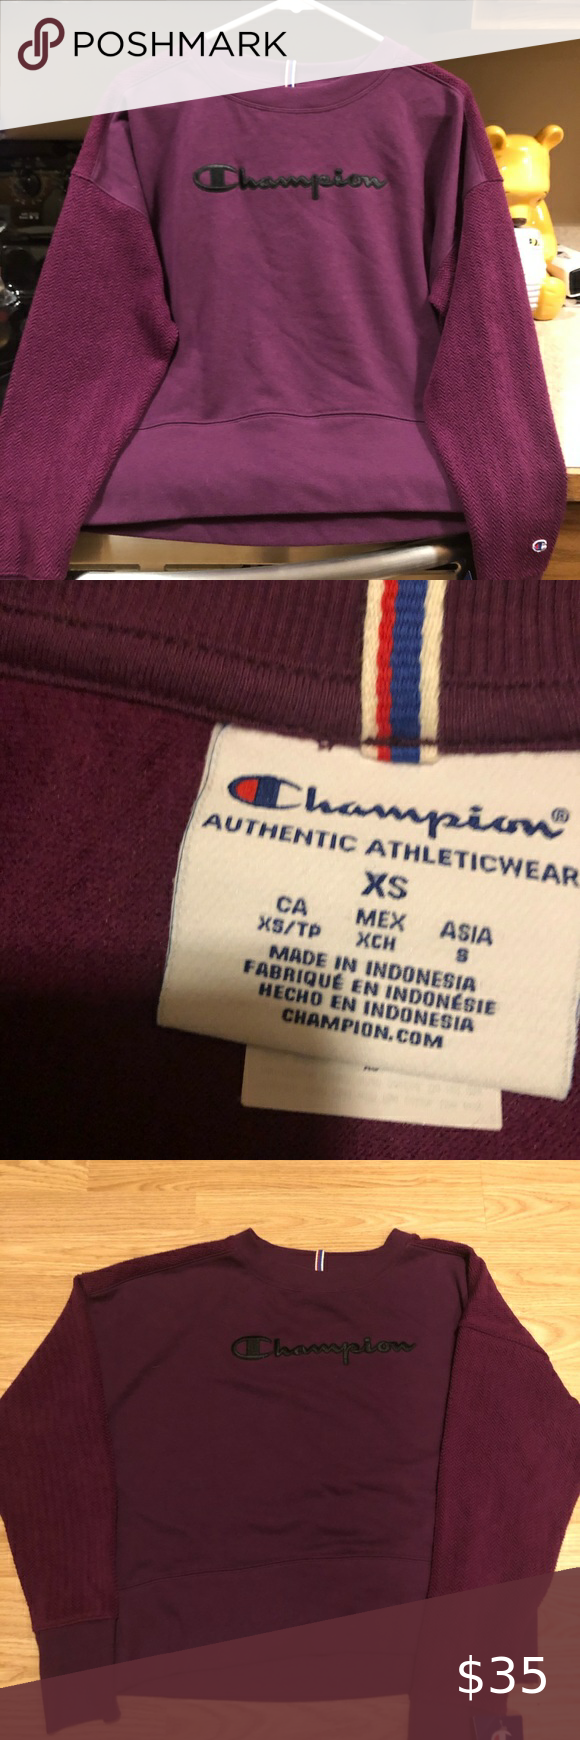 Sold Women S New Champion Sweatshirt Size Xs Champion Sweatshirt Sweatshirts New Champion [ 1740 x 580 Pixel ]